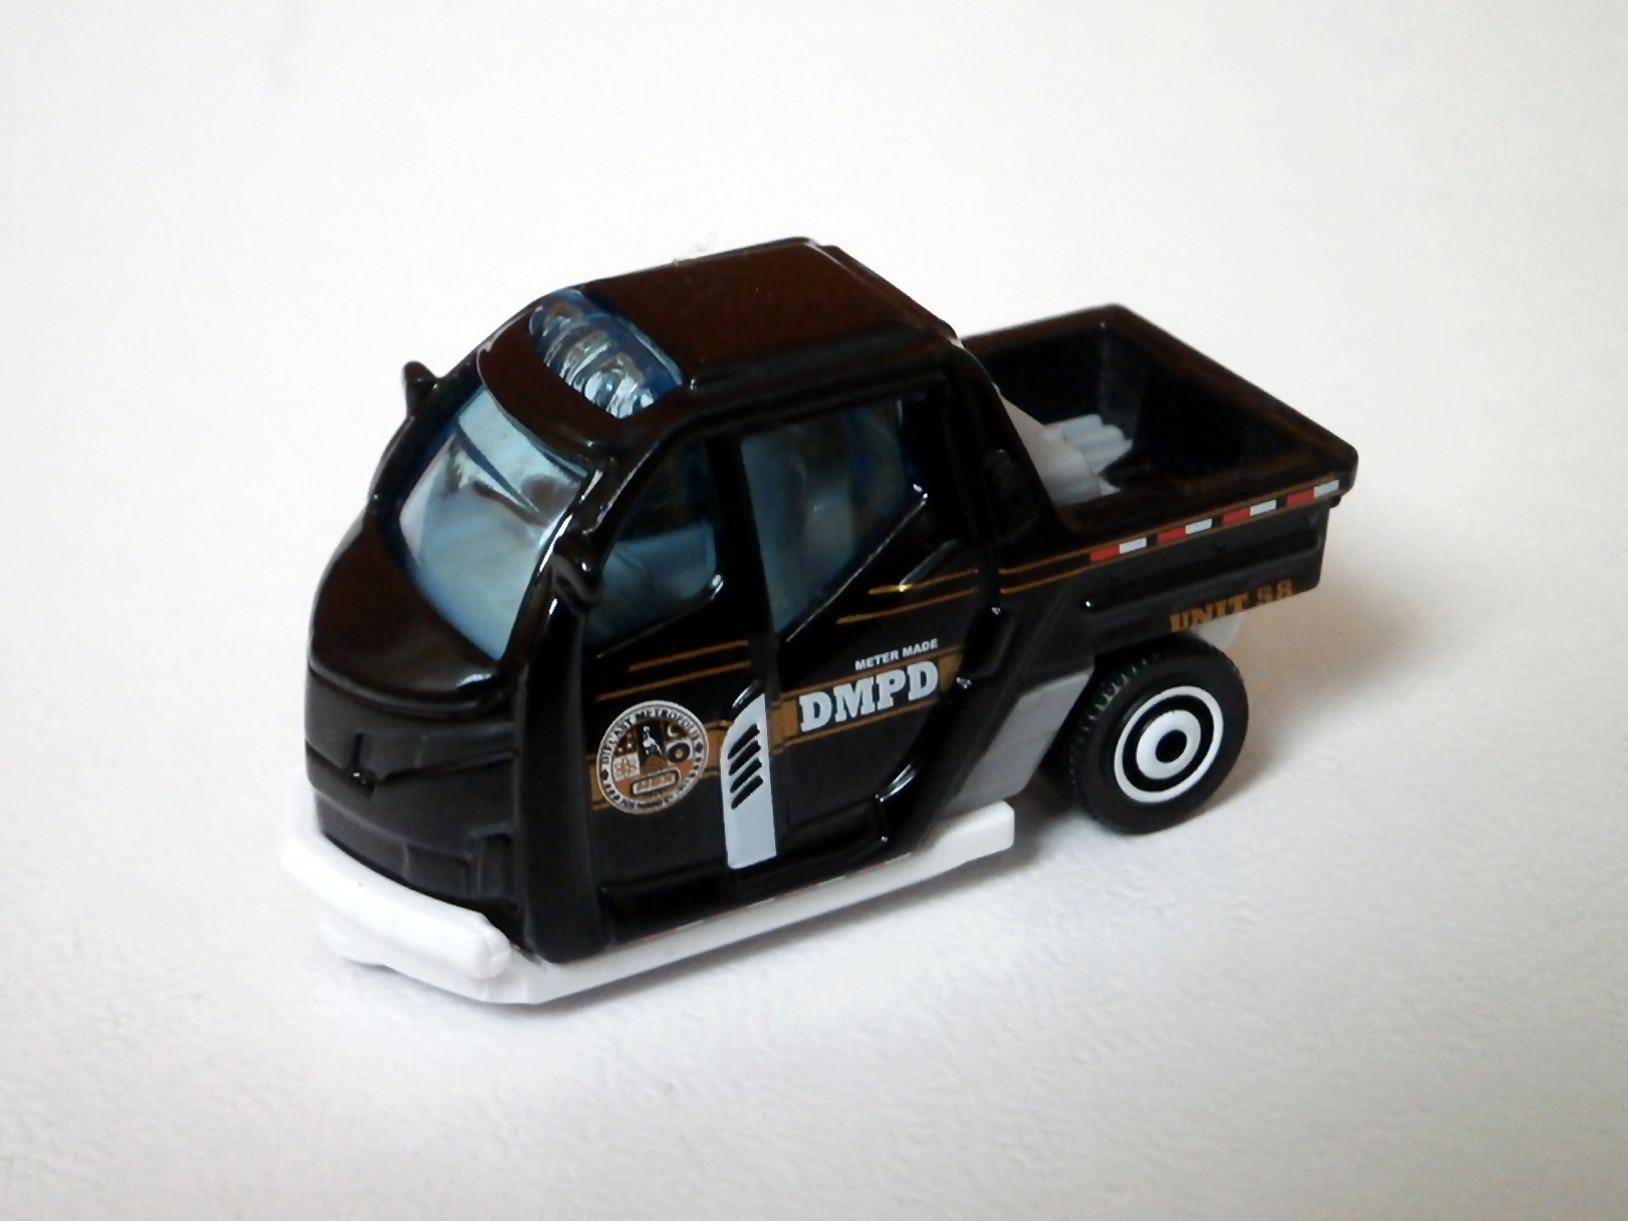 2019 Express Van >> Image - Meter Made (2018 Black).jpg | Matchbox Cars Wiki | FANDOM powered by Wikia